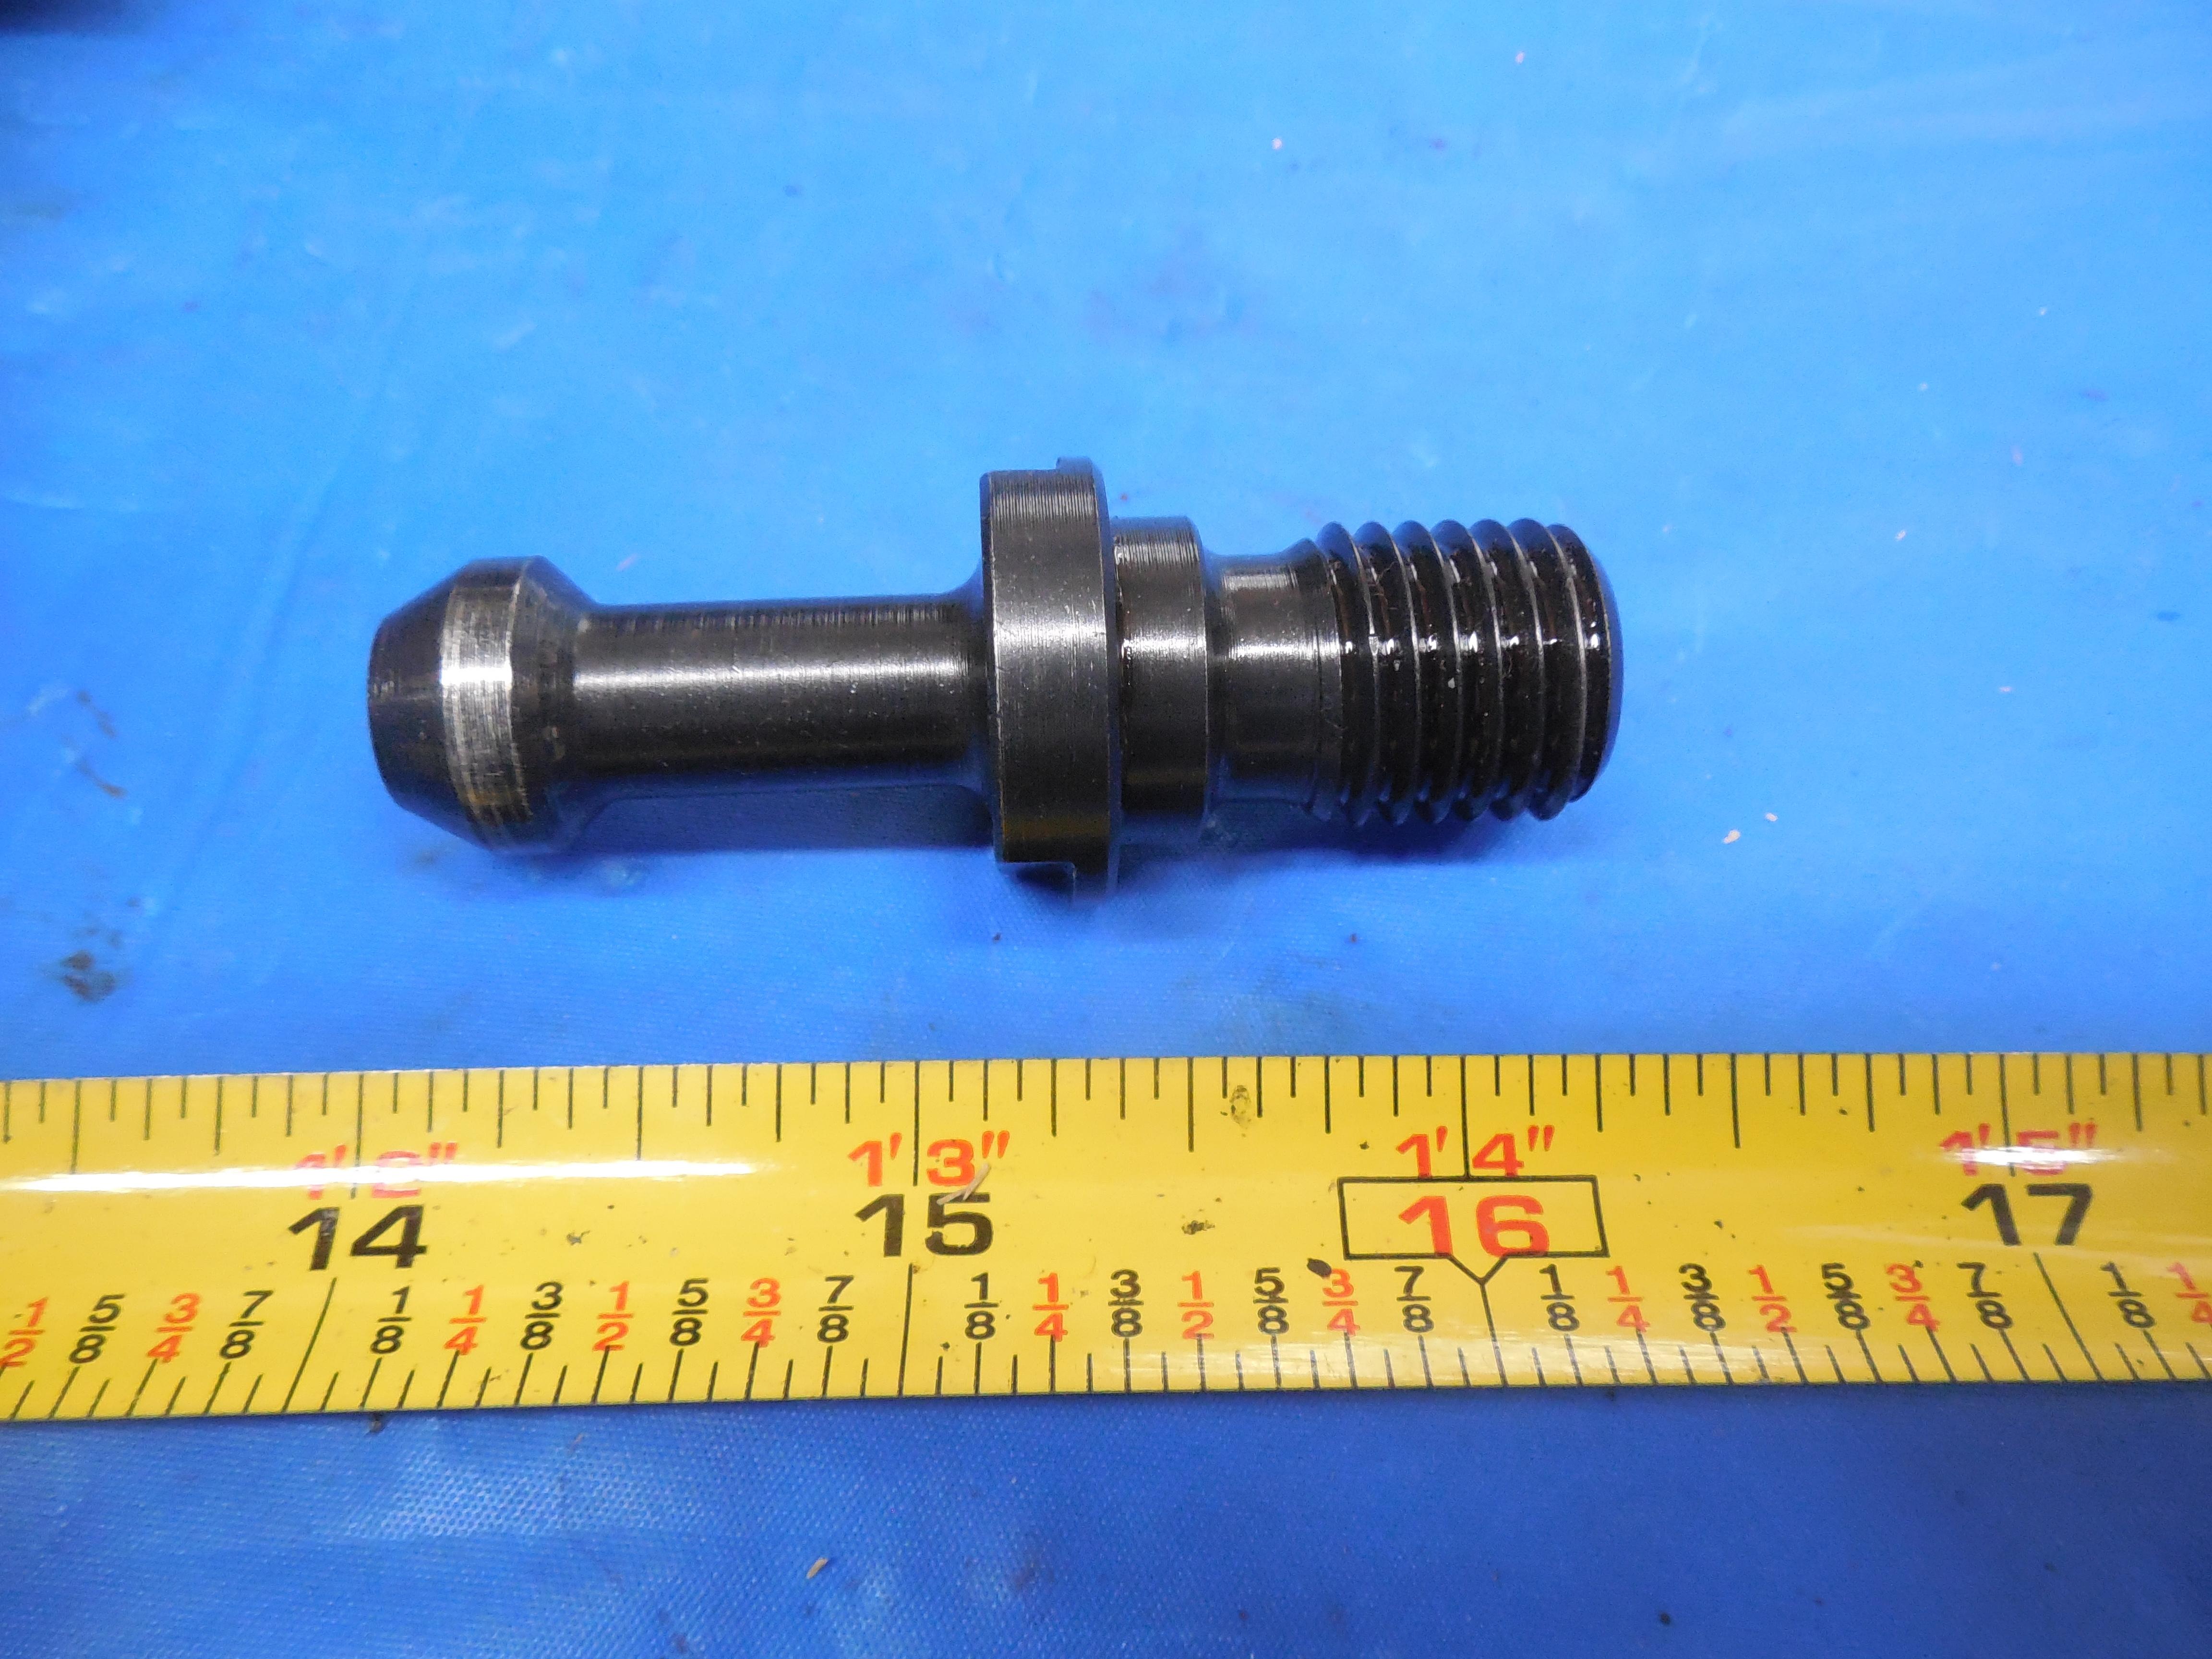 AlTiN 38 mm Length 10.20 mm Cutting Length KYOCERA 226-0524L400 Series 226 Micro Drill Bit 2 Flutes 1.33 mm Cutting Diameter 3 mm Shank Diameter Carbide 130 Degree Cutting Angle